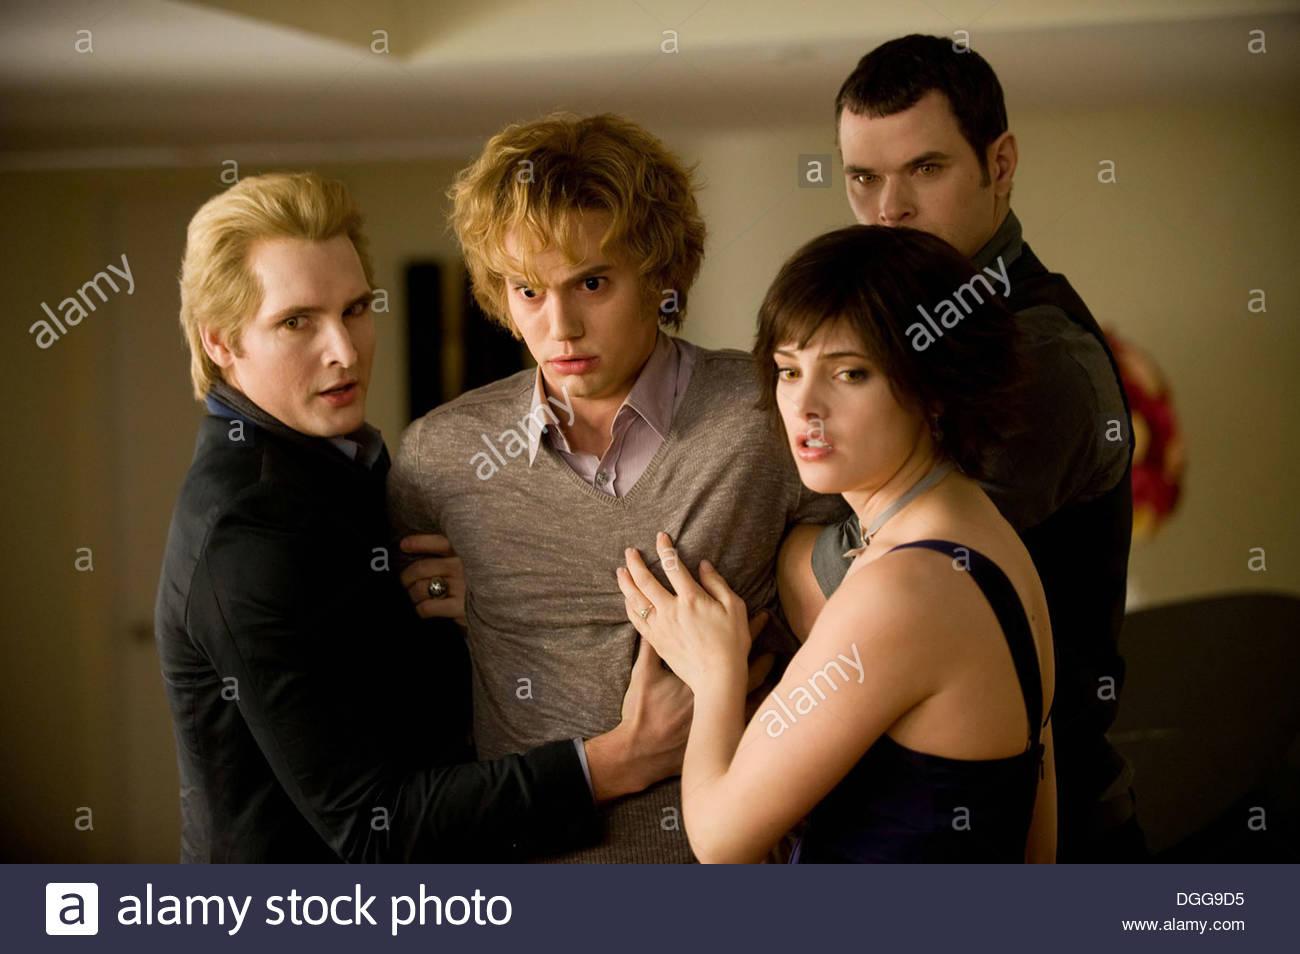 THE TWILIGHT SAGA: NEW MOON 2009) JAMIE CAMPBELL BOWER CHRIS WEITZ DIR) 007 MOVIESTORE COLLECTION LTD - Stock Image